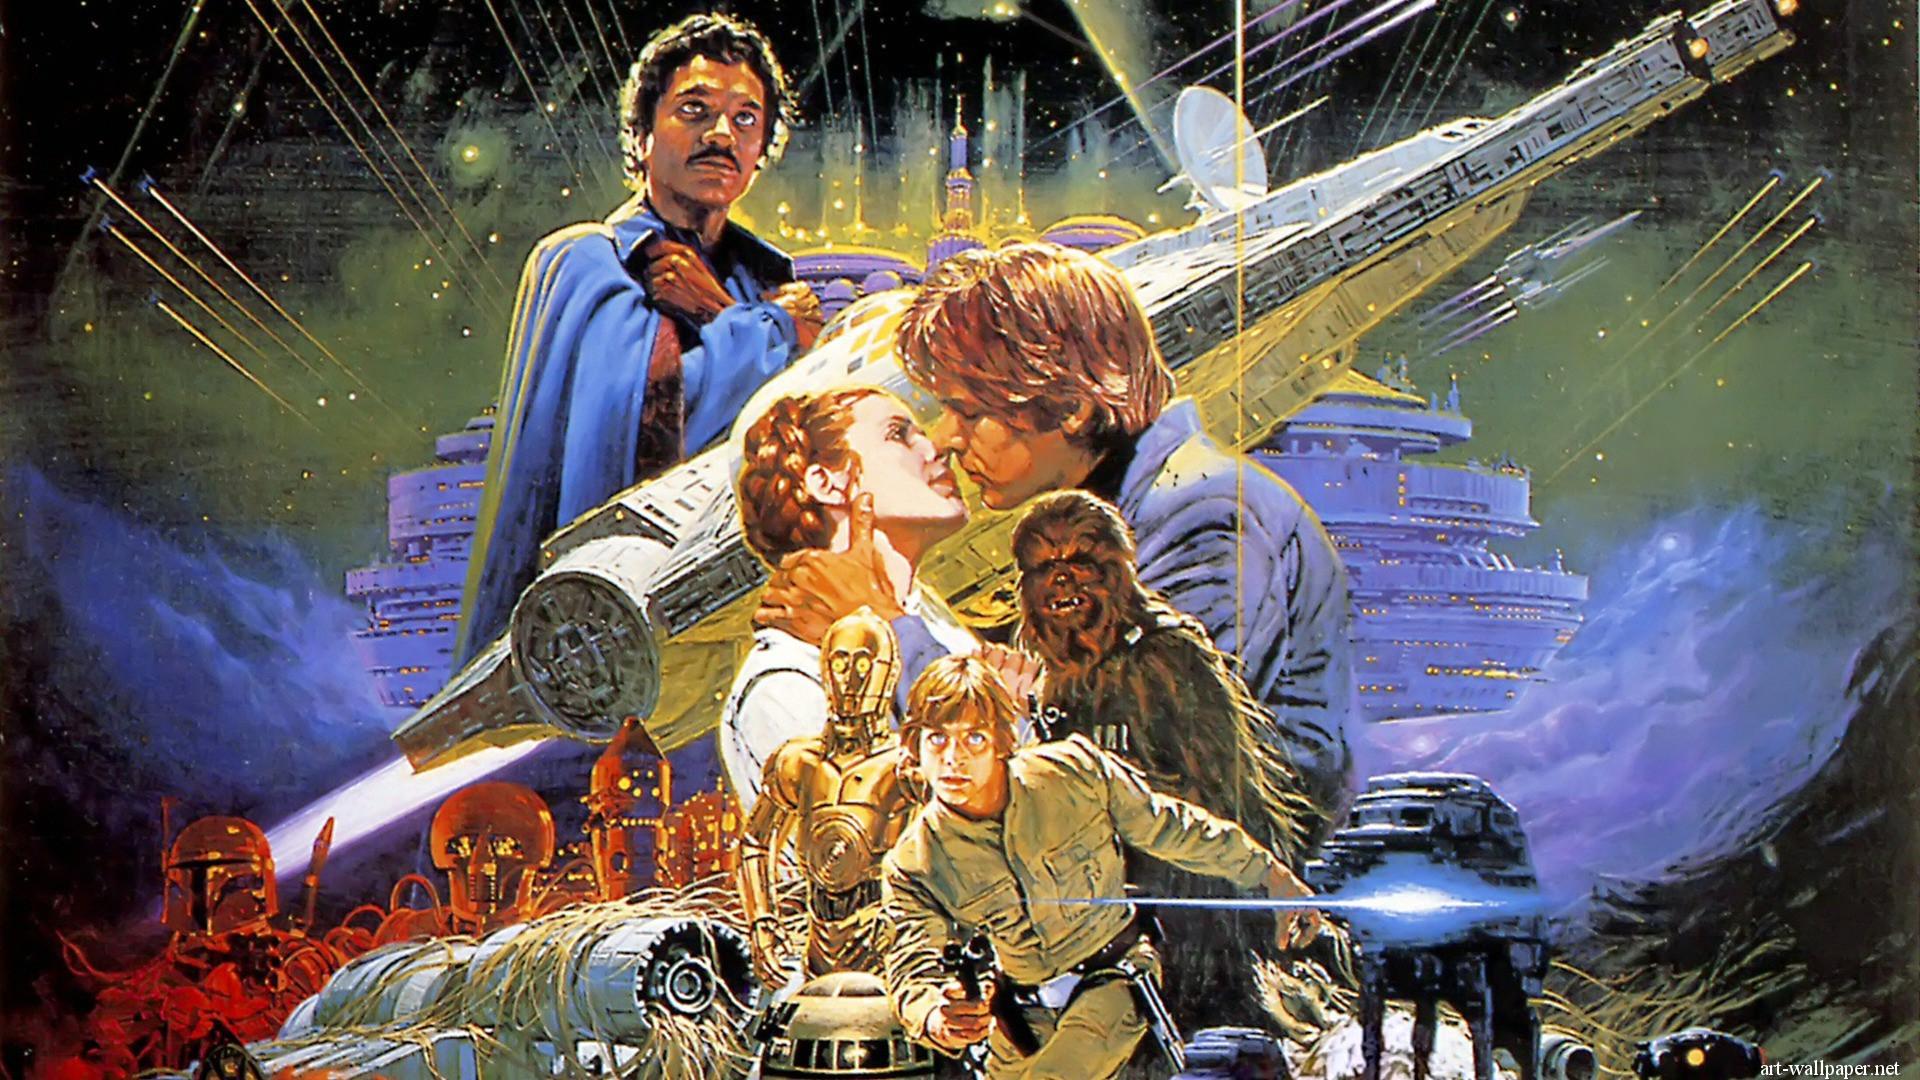 Star Wars Paintings, Star Wars Art, Painting, Wallpaper